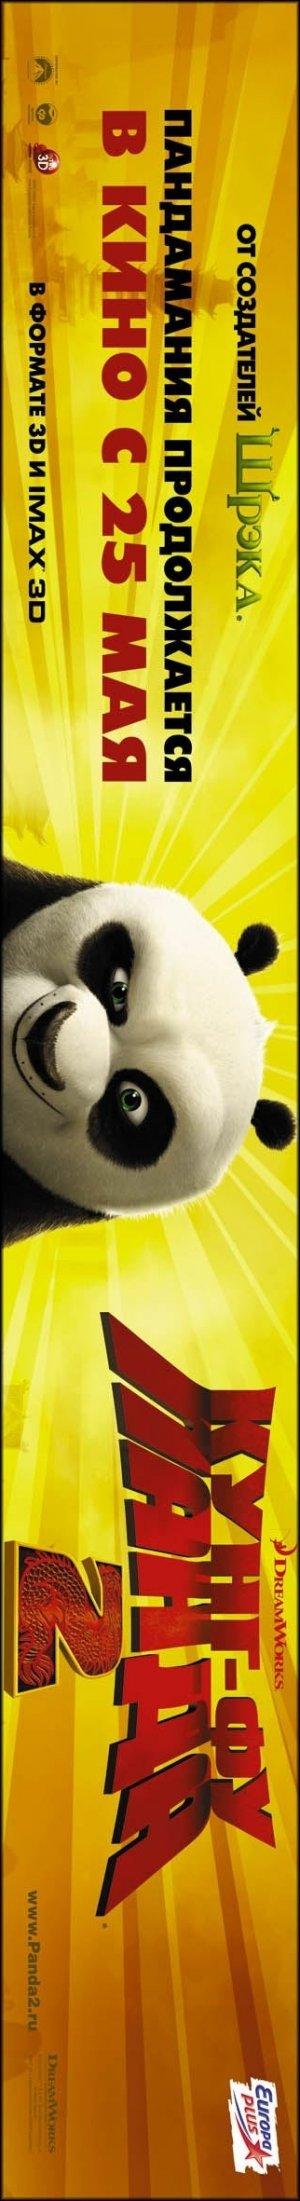 Kung Fu Panda 2 322x2362